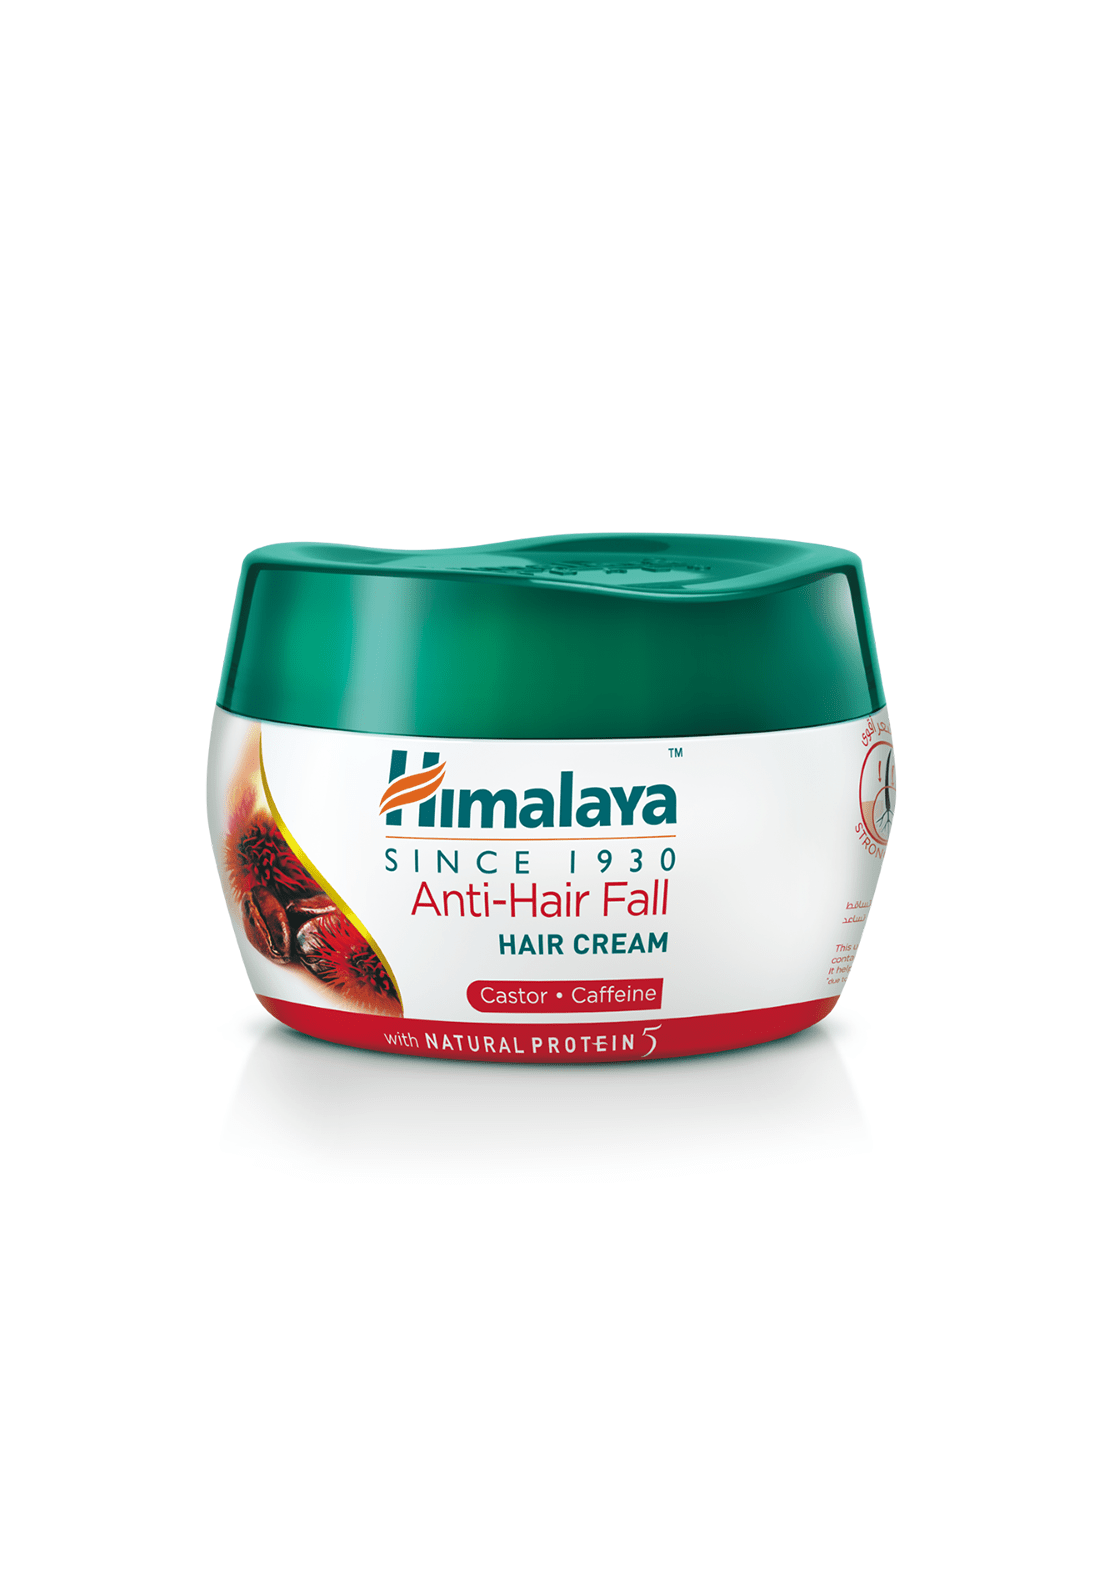 Hair Cream - Anti-Hair Fall Hair Cream هيمالايا كريم ضد تساقط الشعر 140 مل